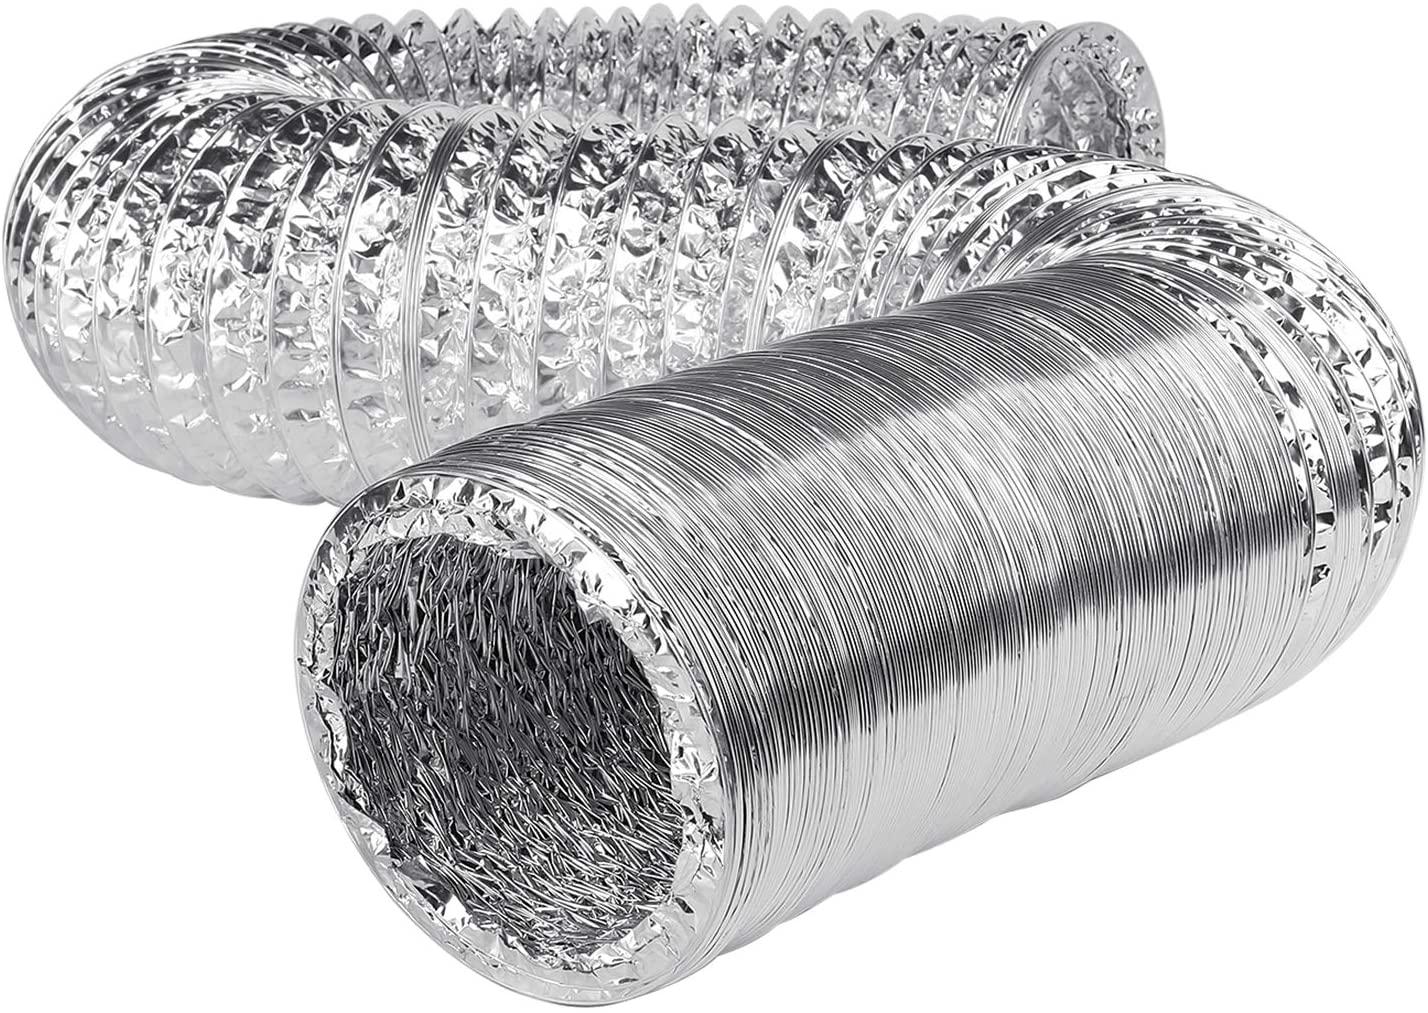 Flexzion Aluminum Ducting Dryer Vent Hose (4